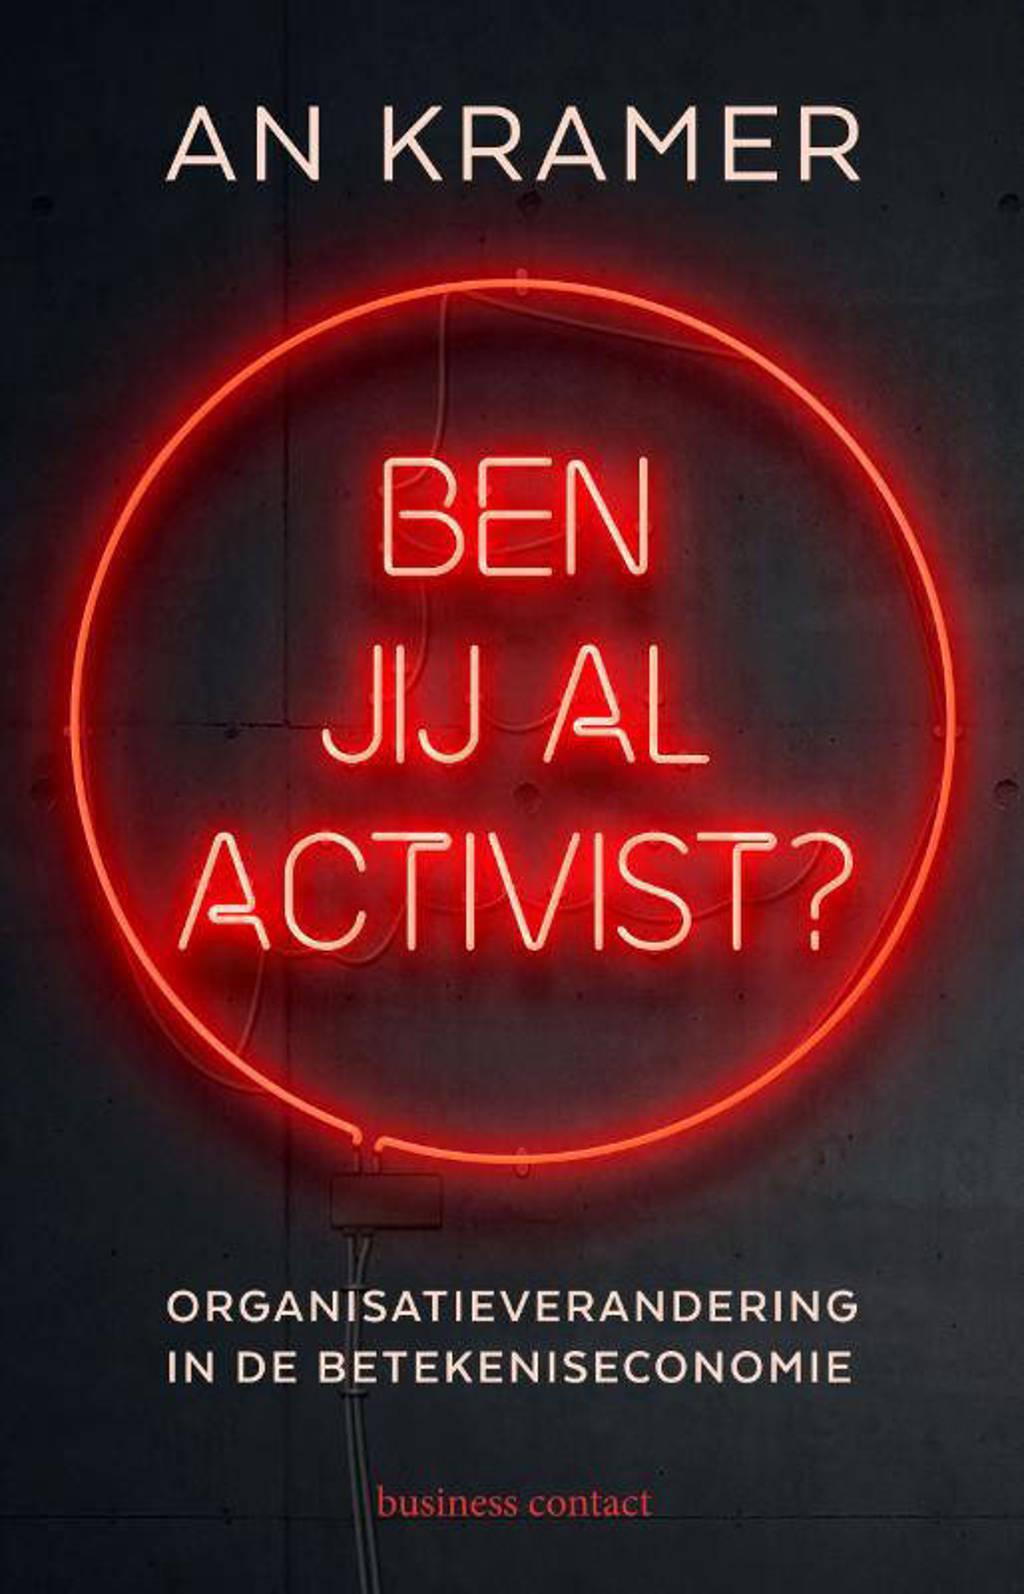 Ben jij al activist? - An Kramer